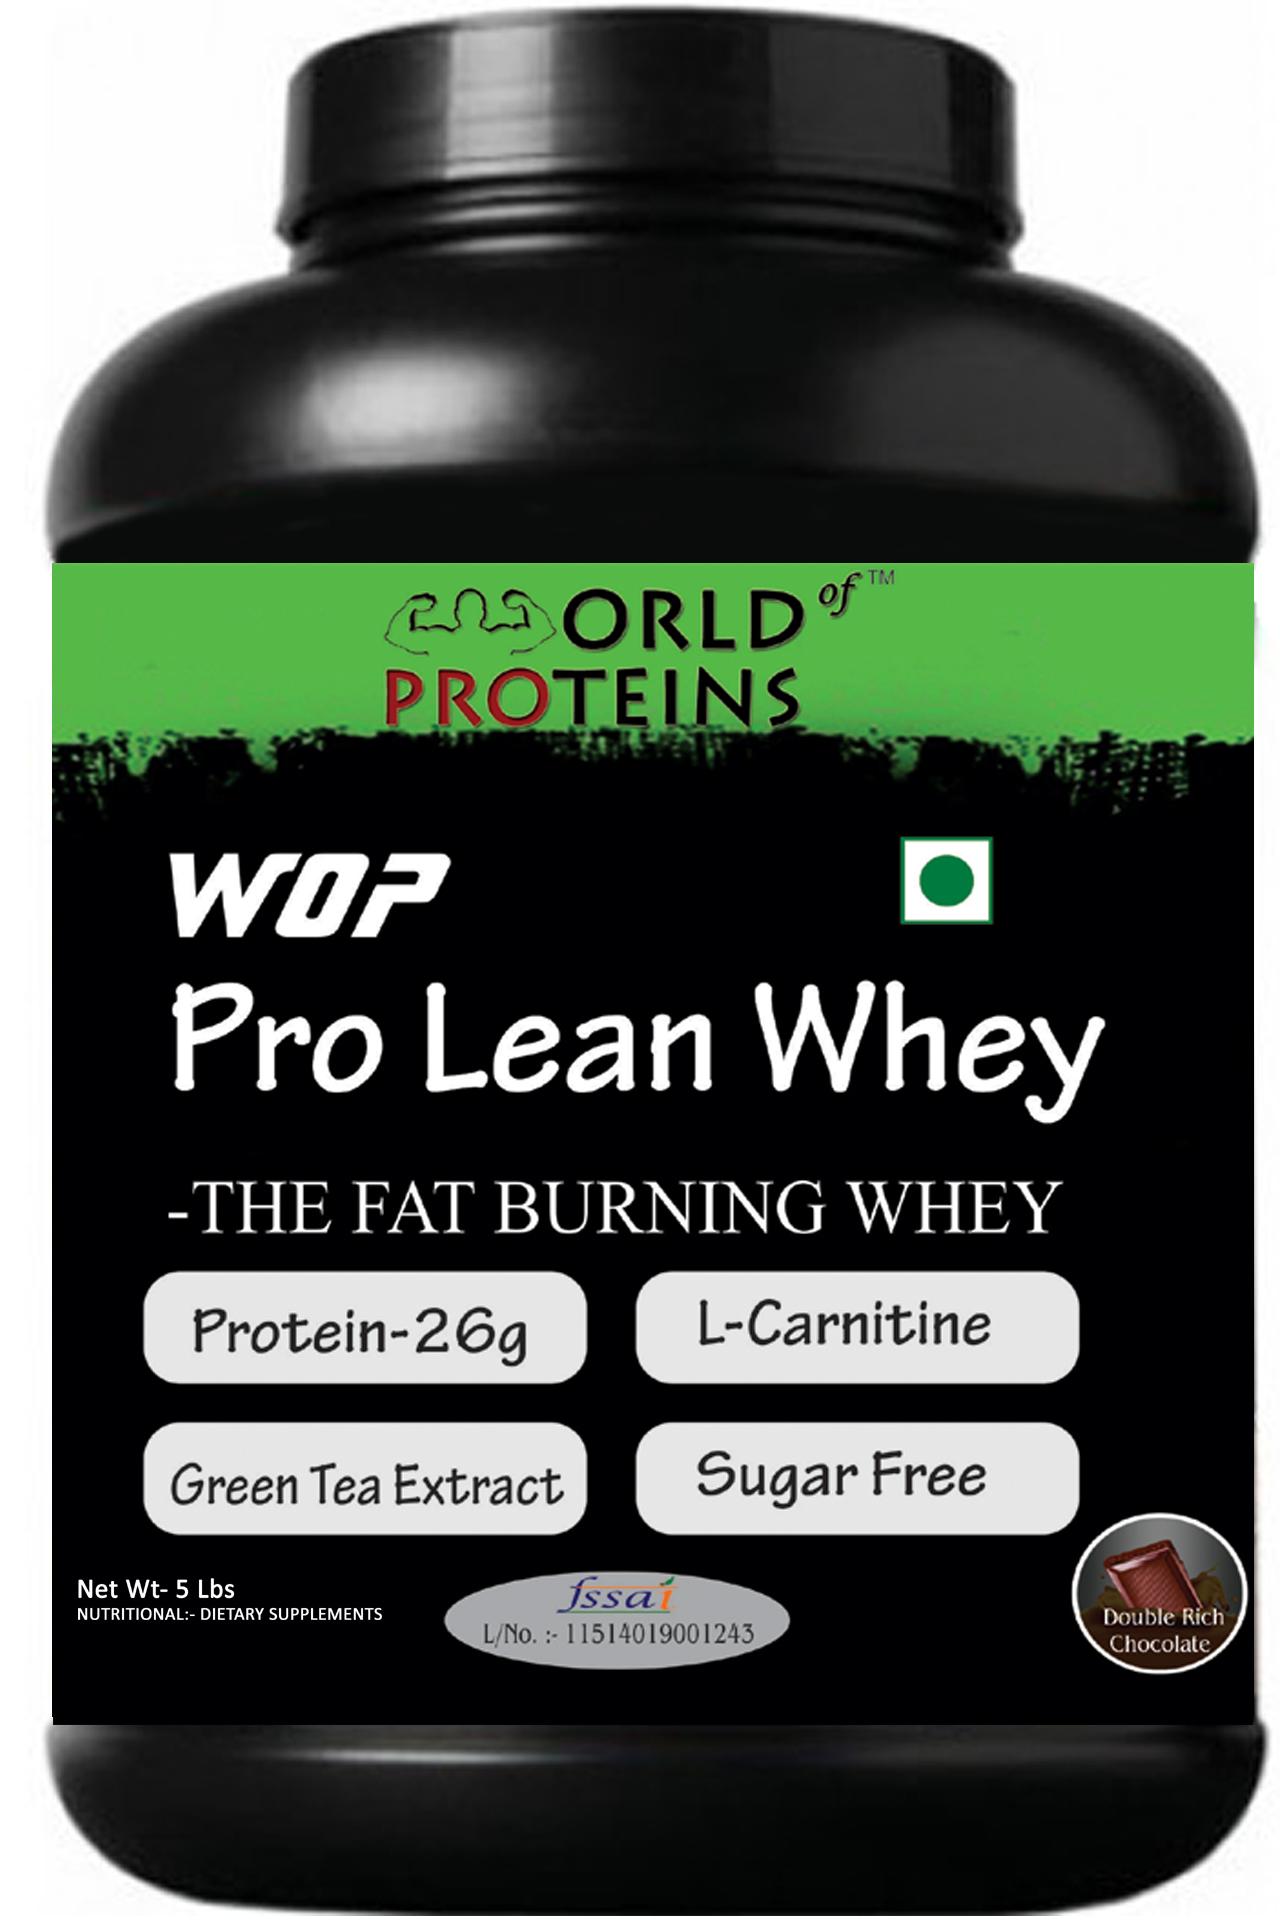 WOP PRO LEAN WHEY,5-lb double-rich-chocolate ,Shaker Free!